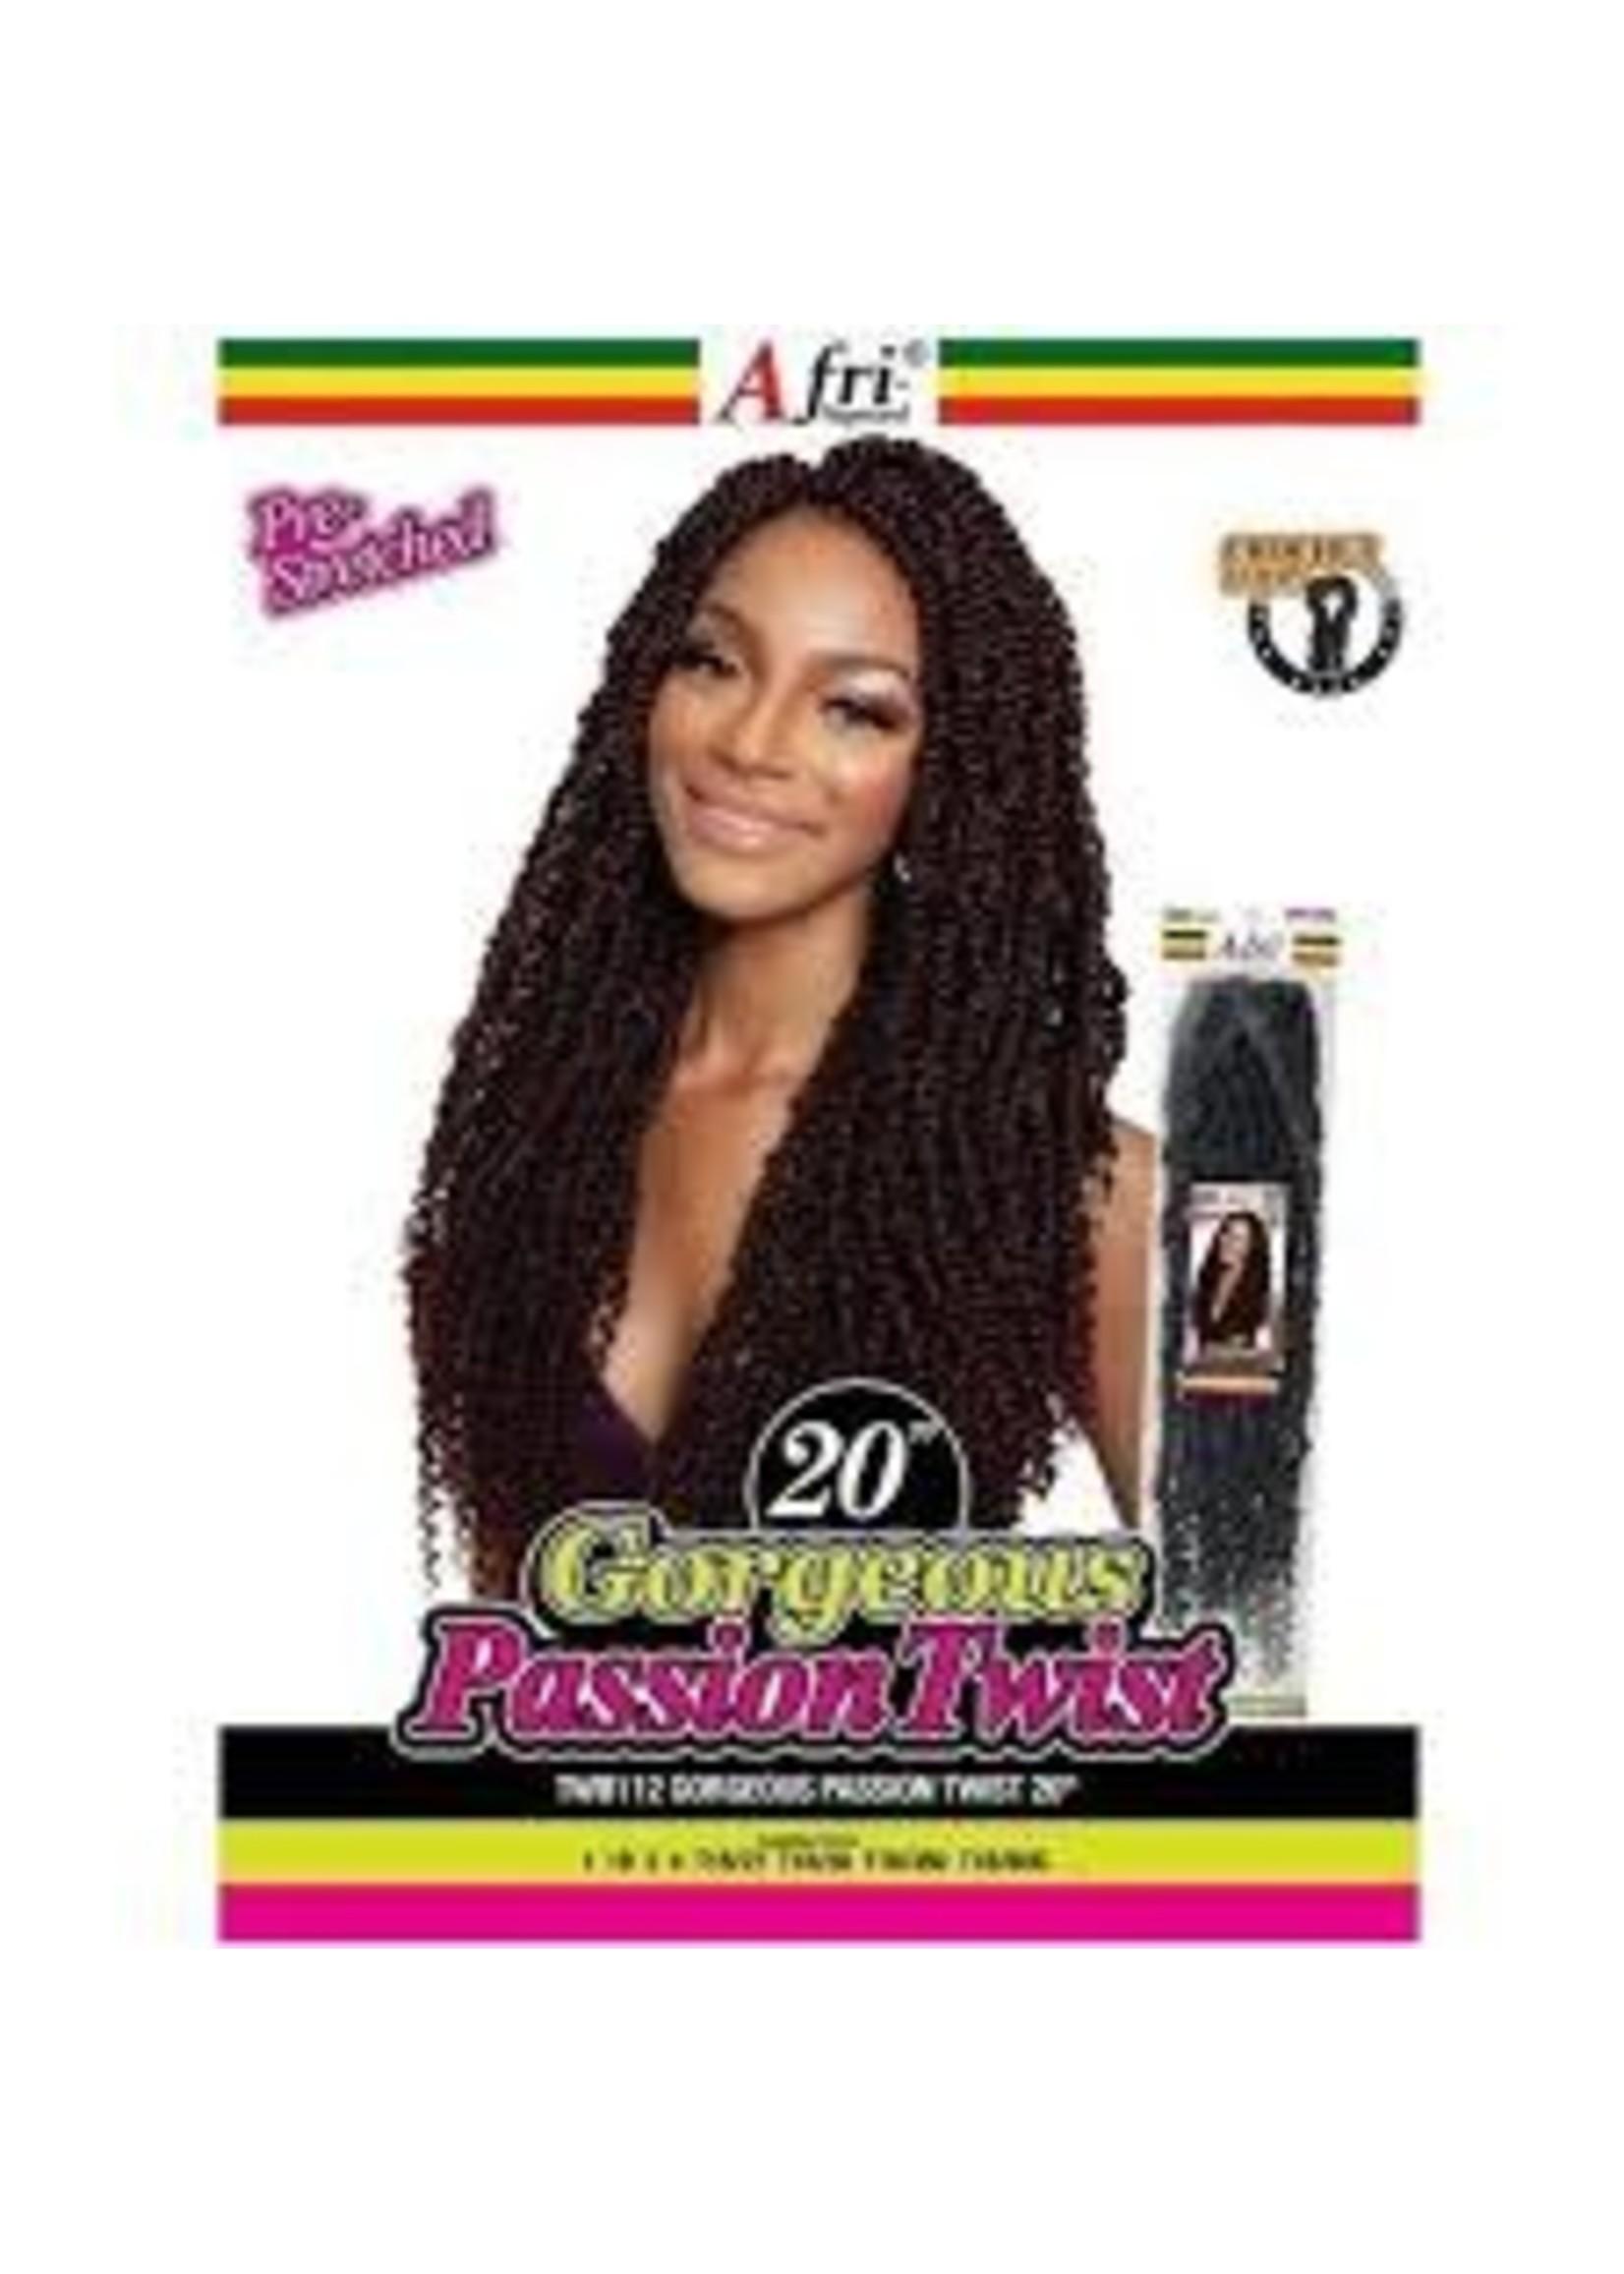 "Afri Naptural Gorgeous Passion Twist 20"""